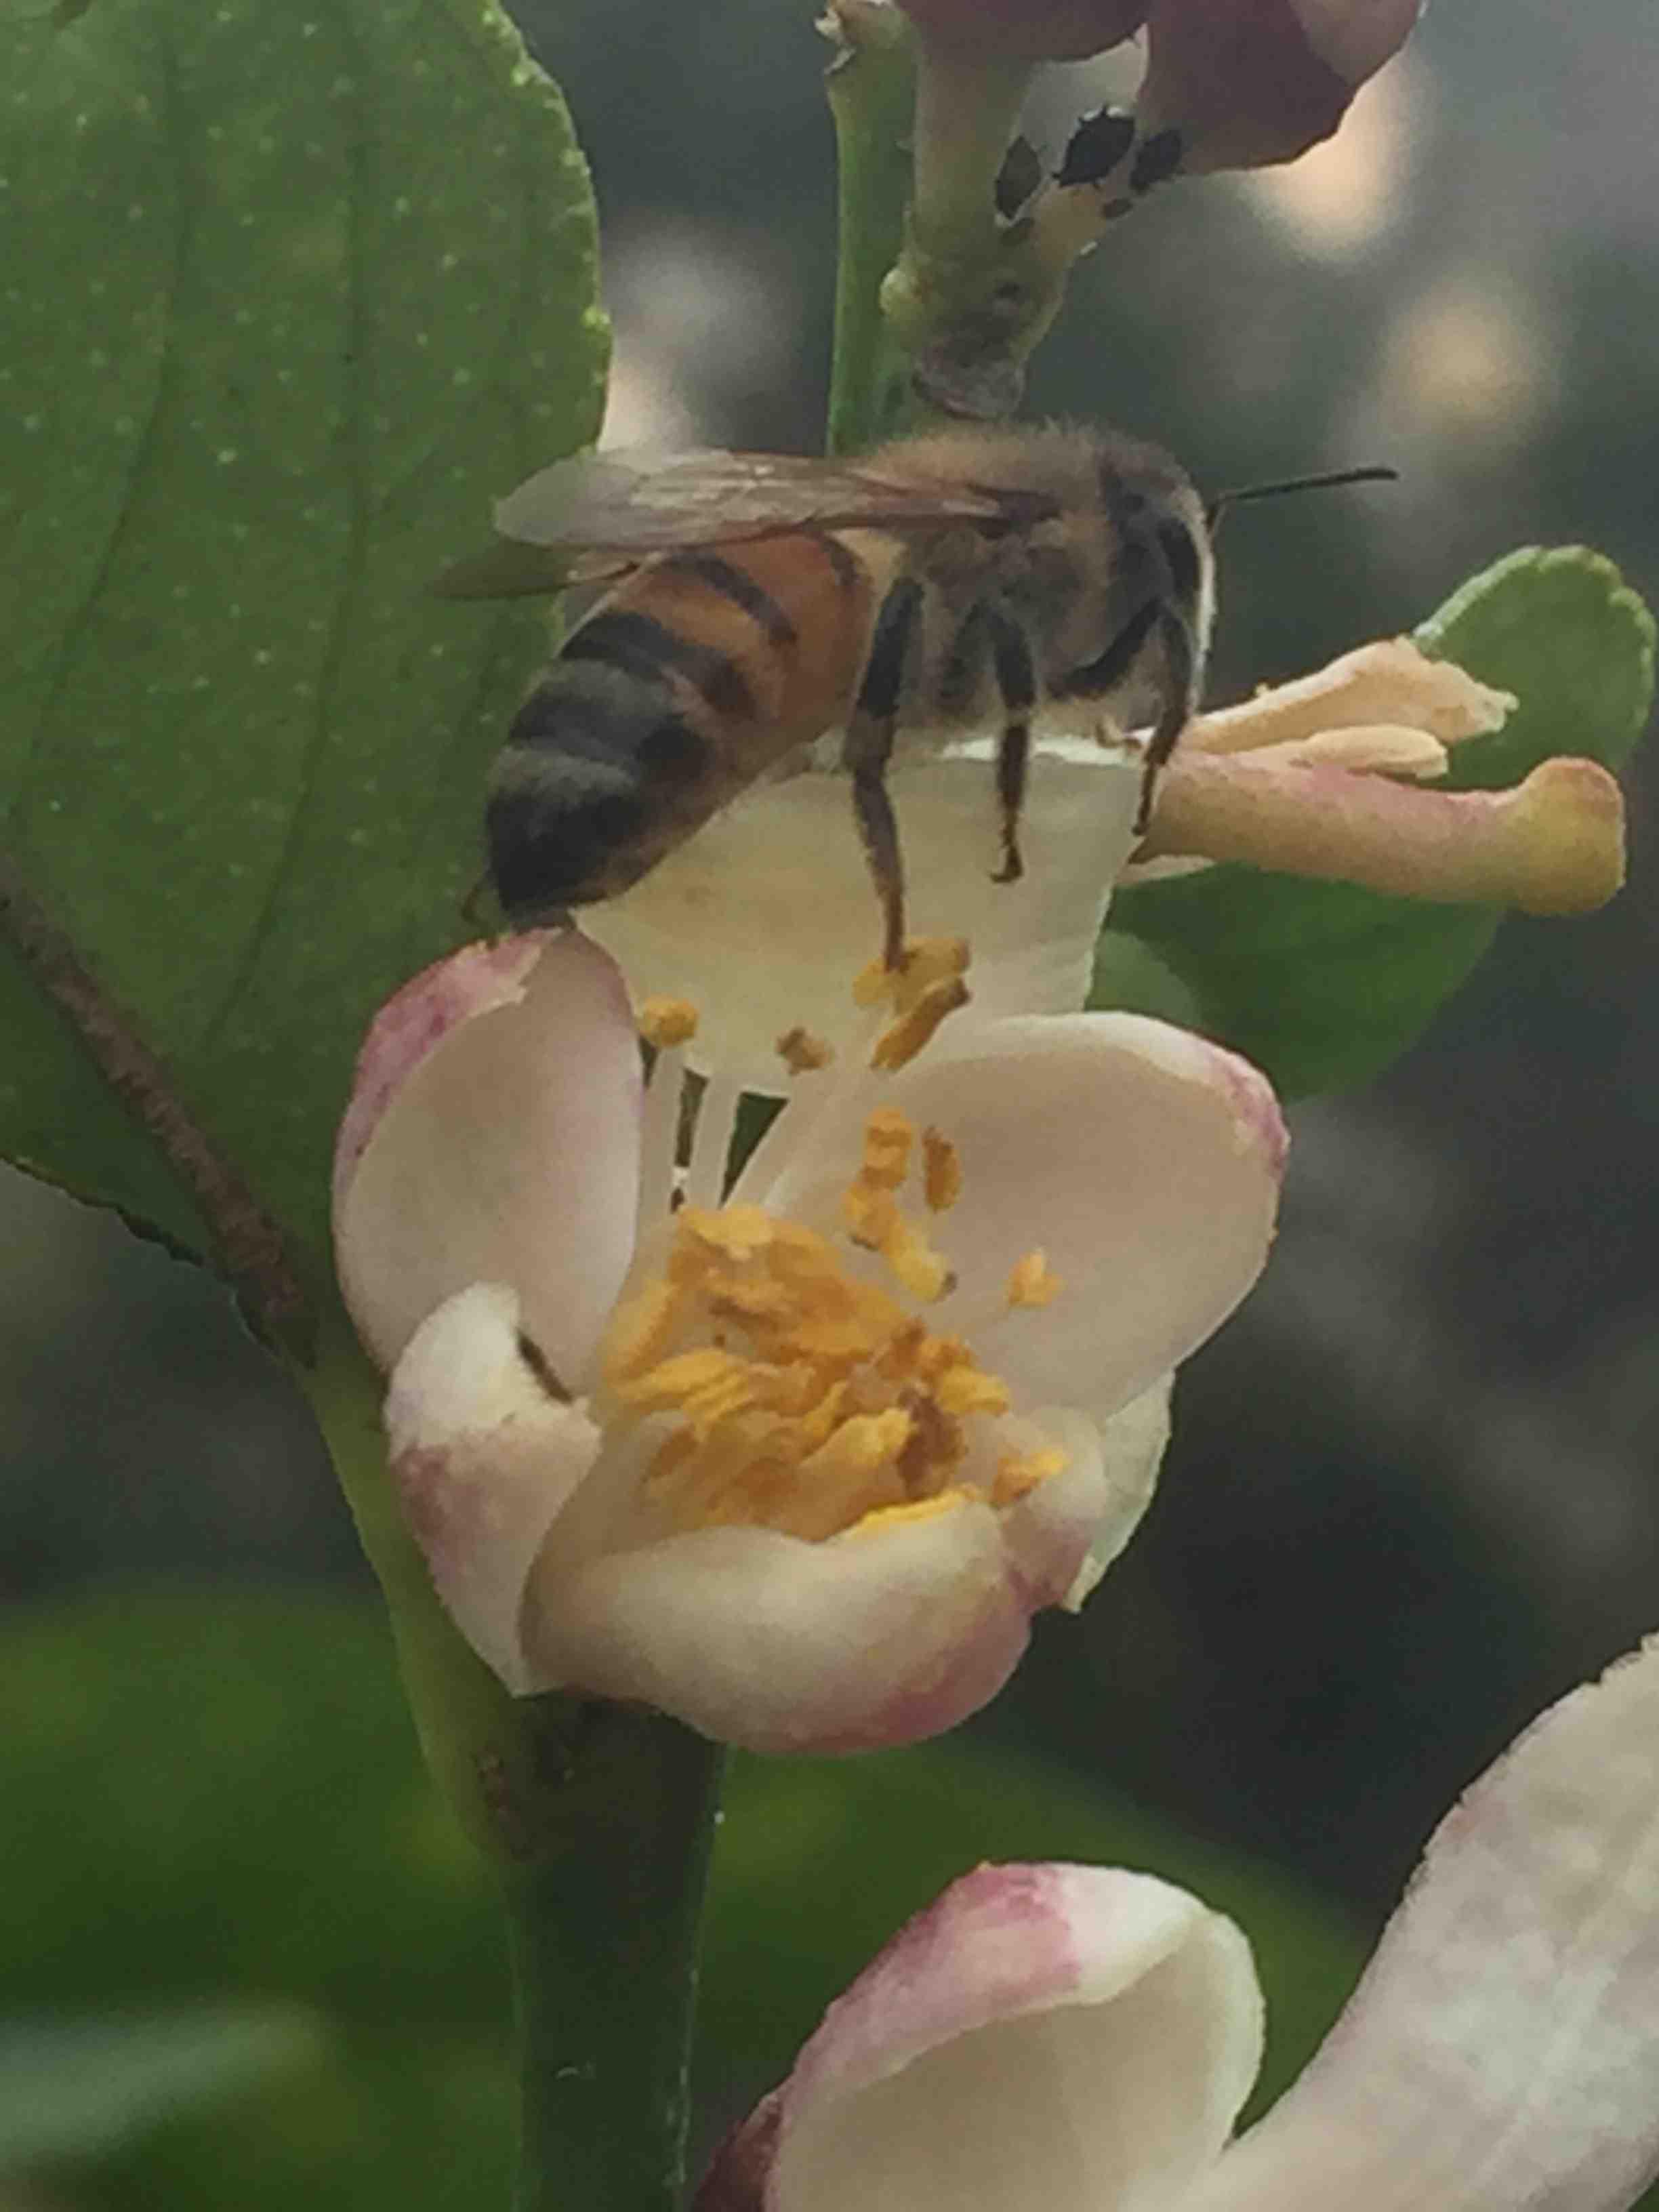 Honeybee napping on lemon blossom petal.